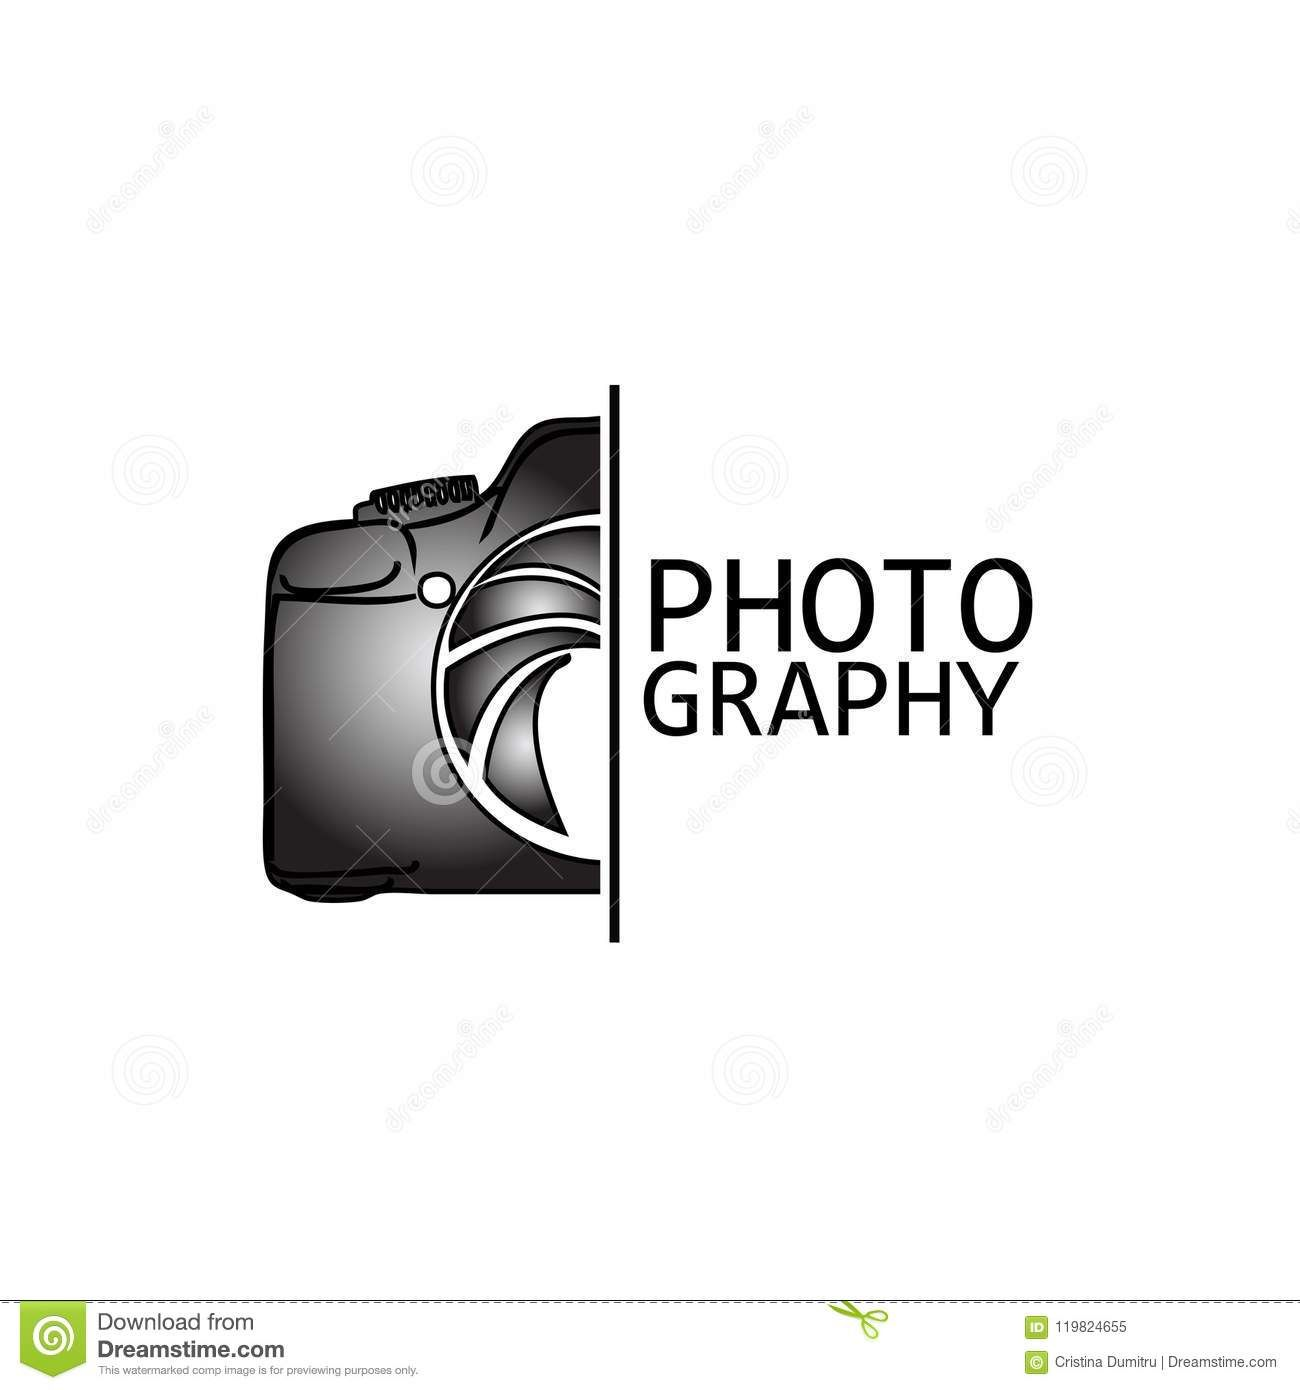 Photography Logo Concept Design Vector Template Stock Vector Illustration Of Design Photographer In 2021 Photography Name Logo Photography Logos Camera Logos Design Camera logo png hd free download